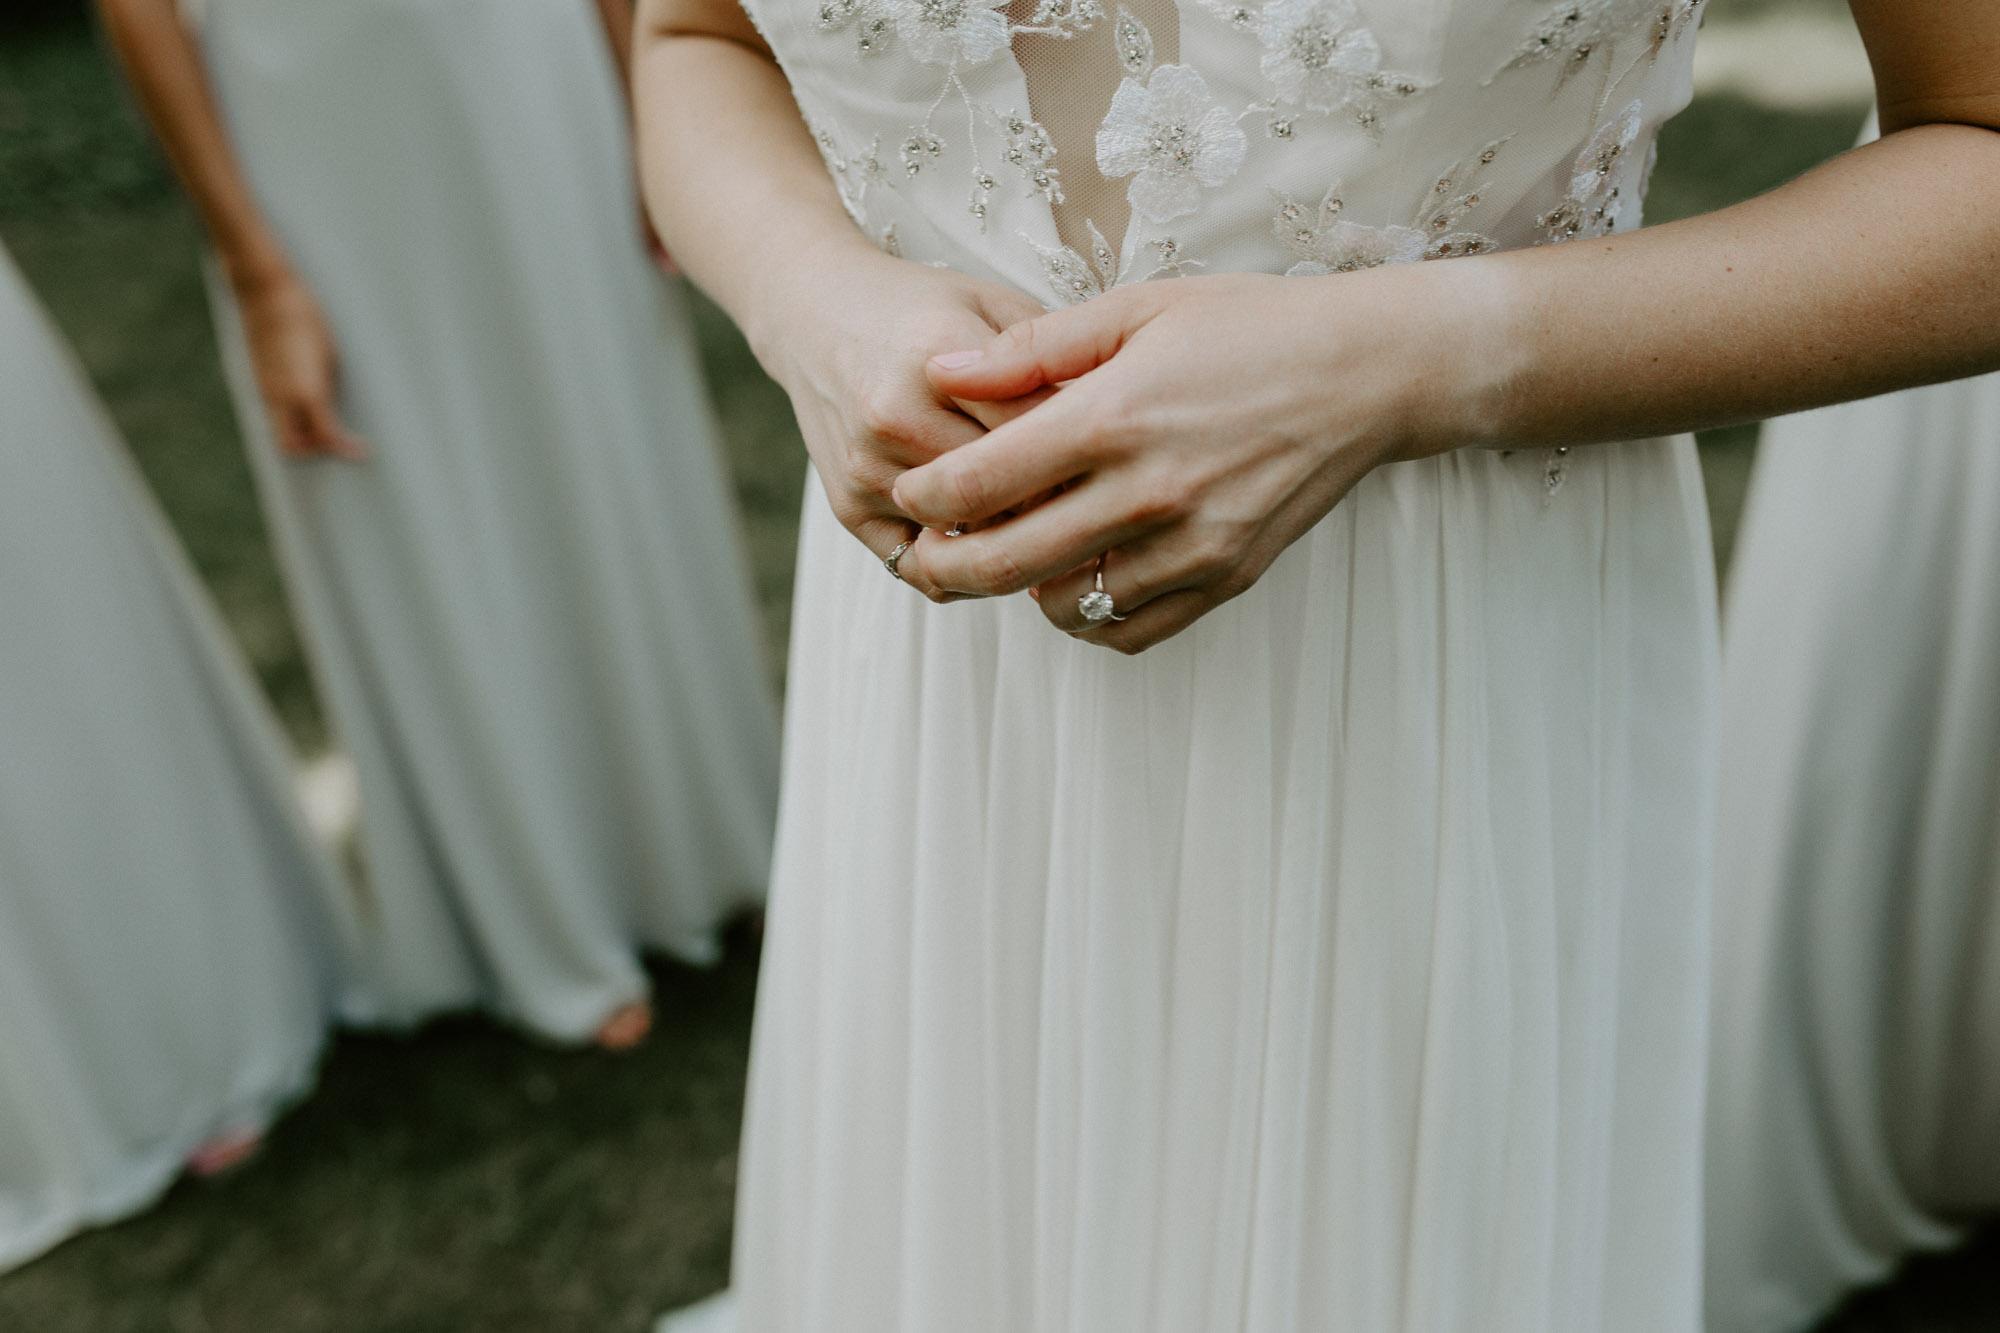 journeyman_distillery_wedding_photographer_chicago_il_wright_photographs-2037.jpg